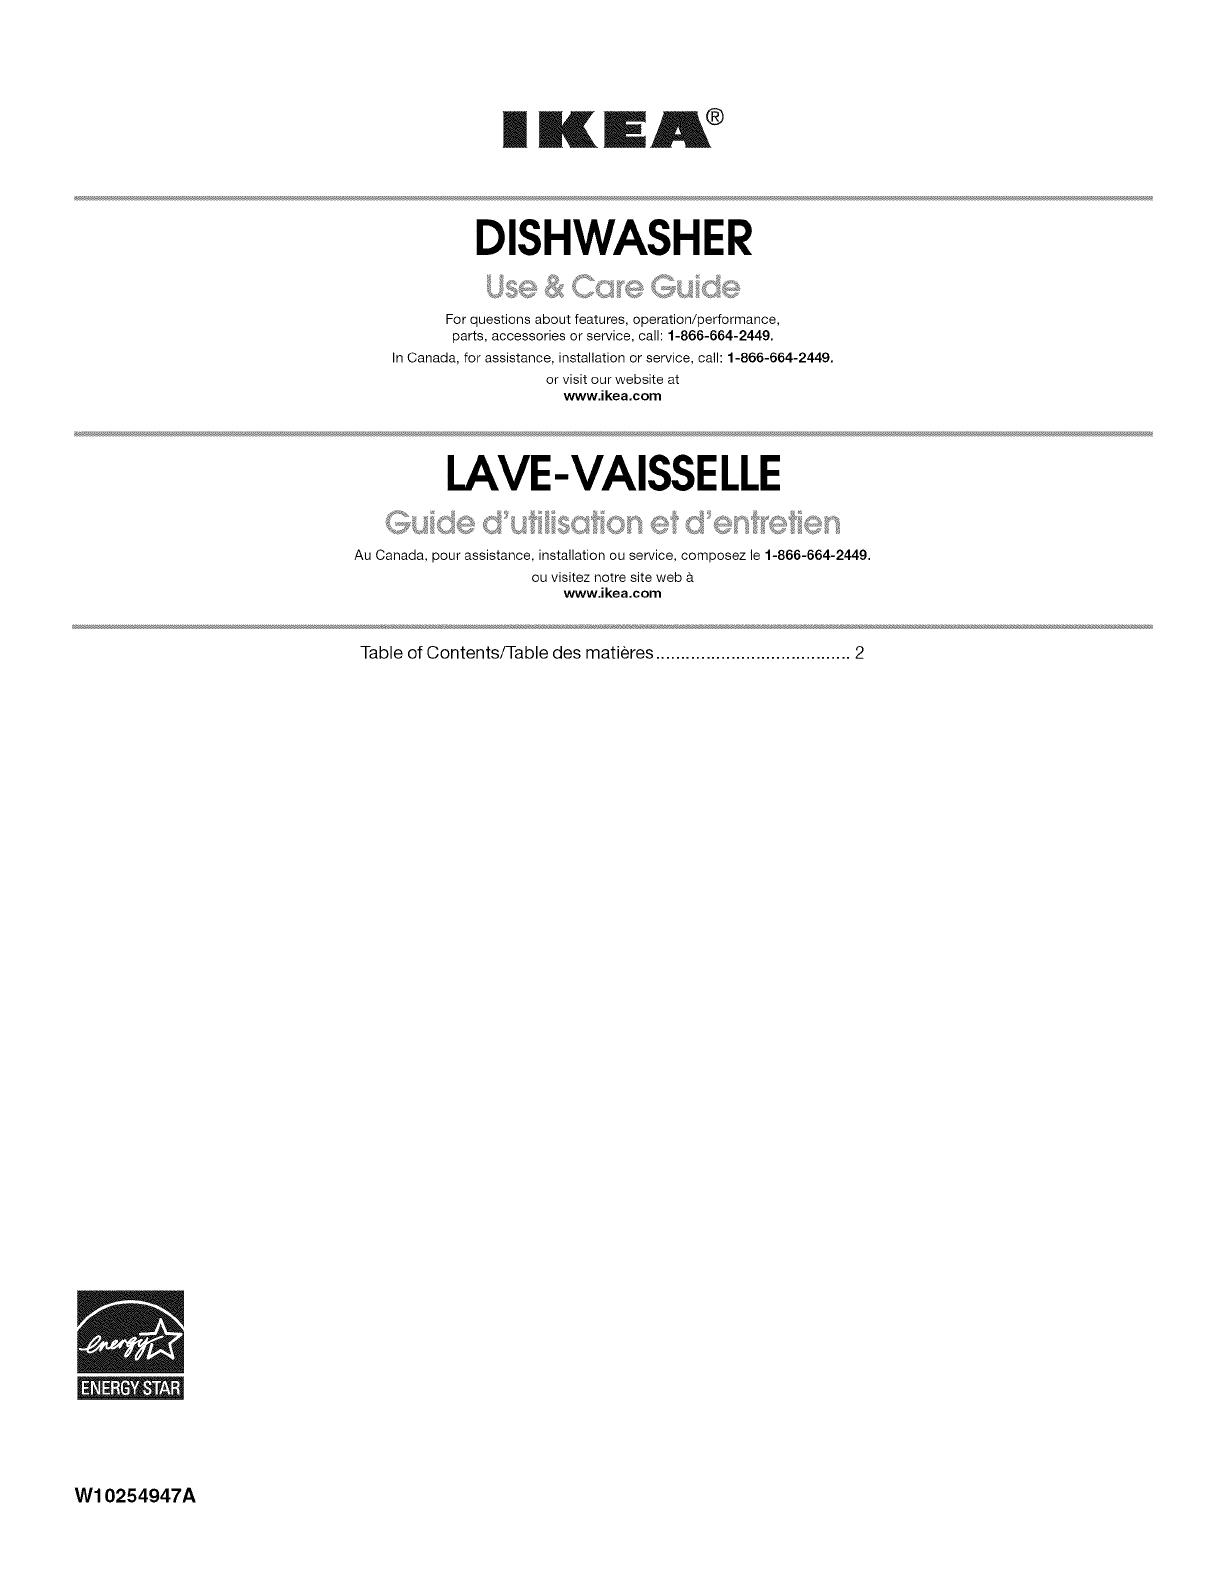 ikea dishwasher manual l1001089